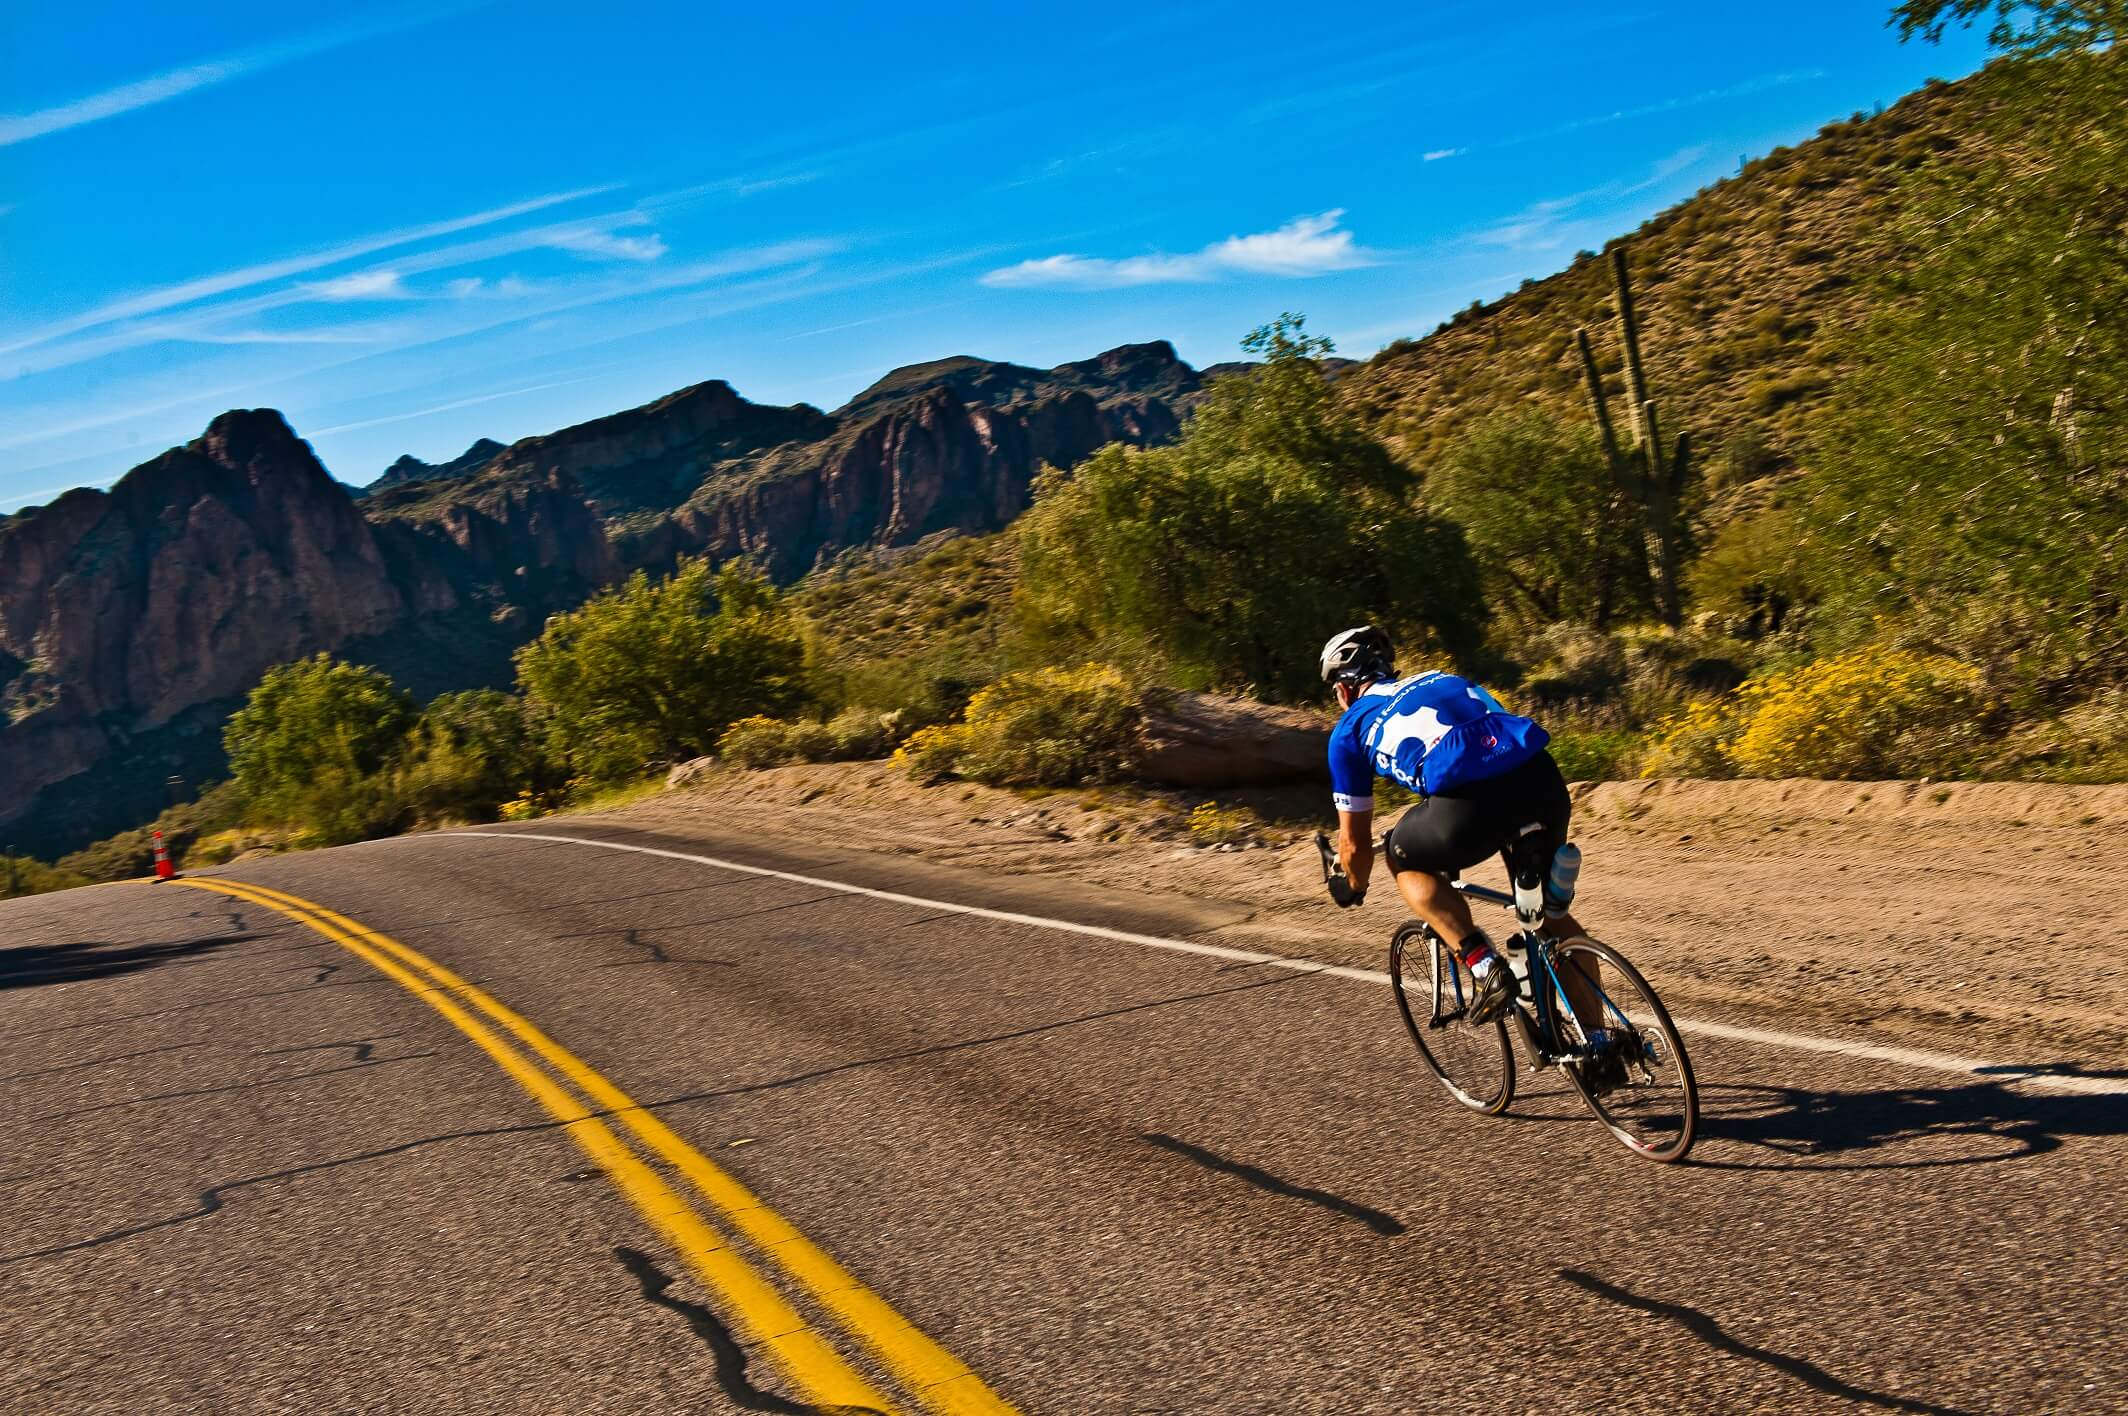 road cycling the bush highway in Mesa, AZ